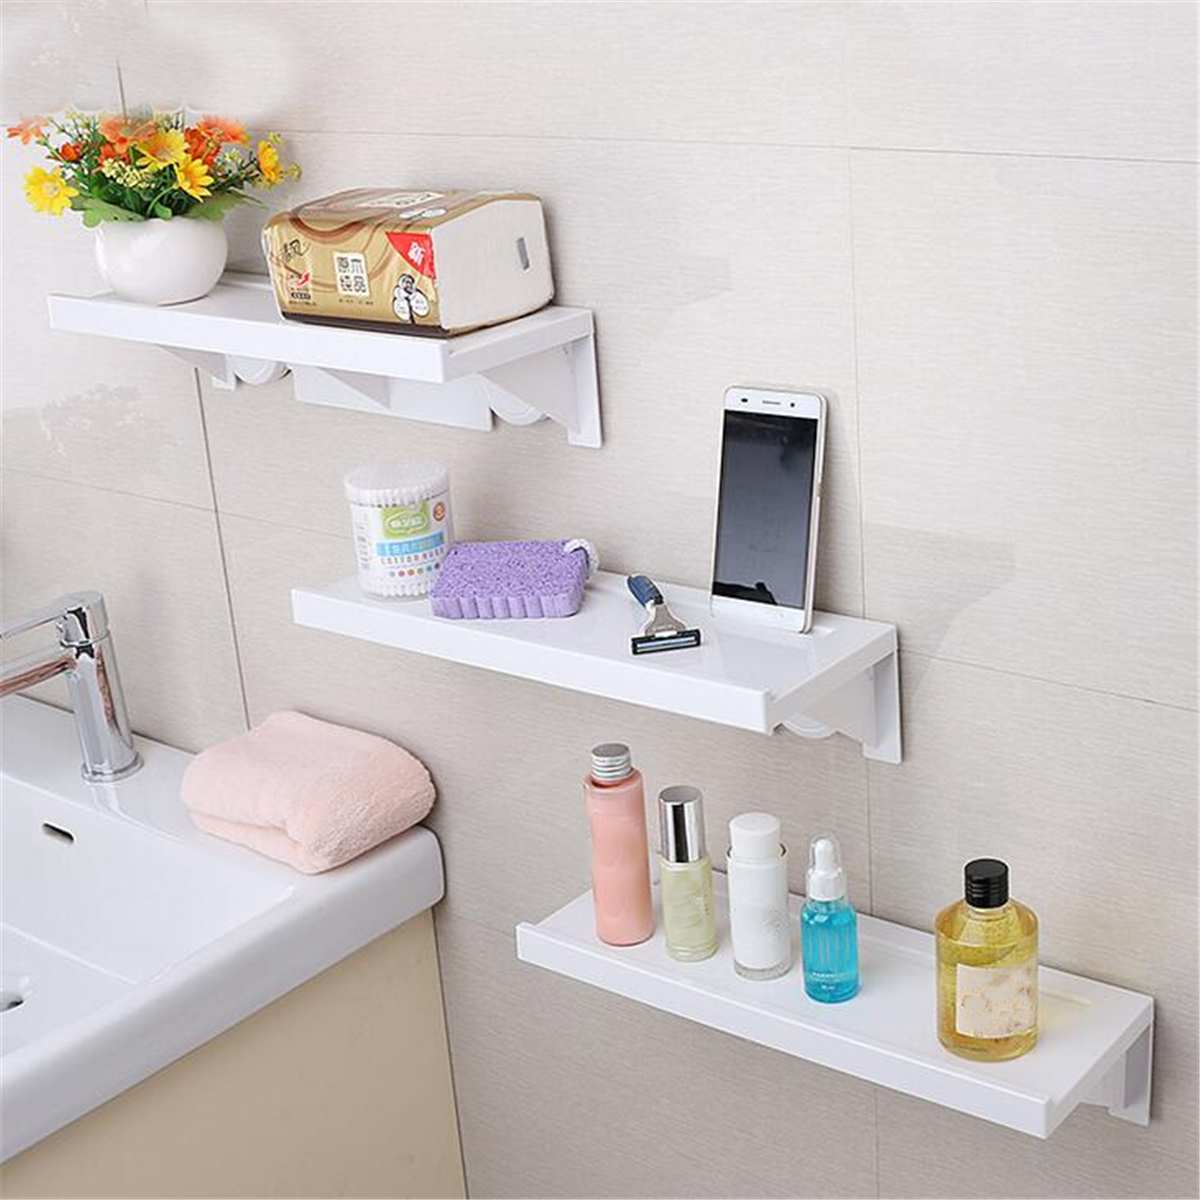 5kg Bathroom Wall Hanging Shelf Caddy Storage Holder Shower Rack Shelf Shampoo Organiser Suction Cups Free Punching White